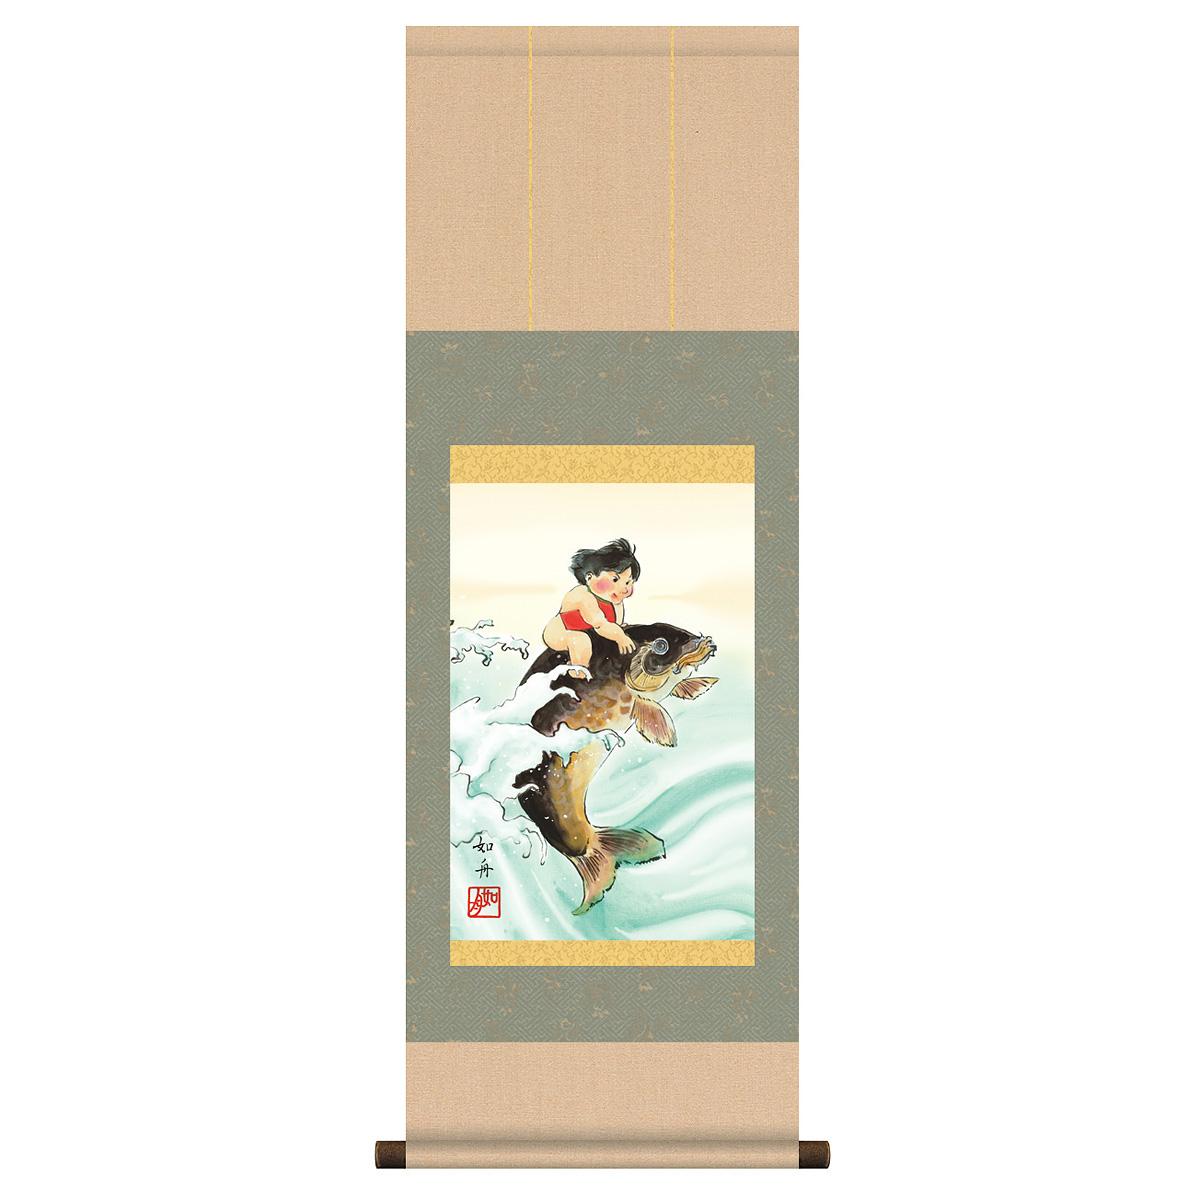 端午の節句 正月 掛け軸 掛軸 「美原如舟(白翠会)作 大昇鯉」 ●正月飾り 端午の節句